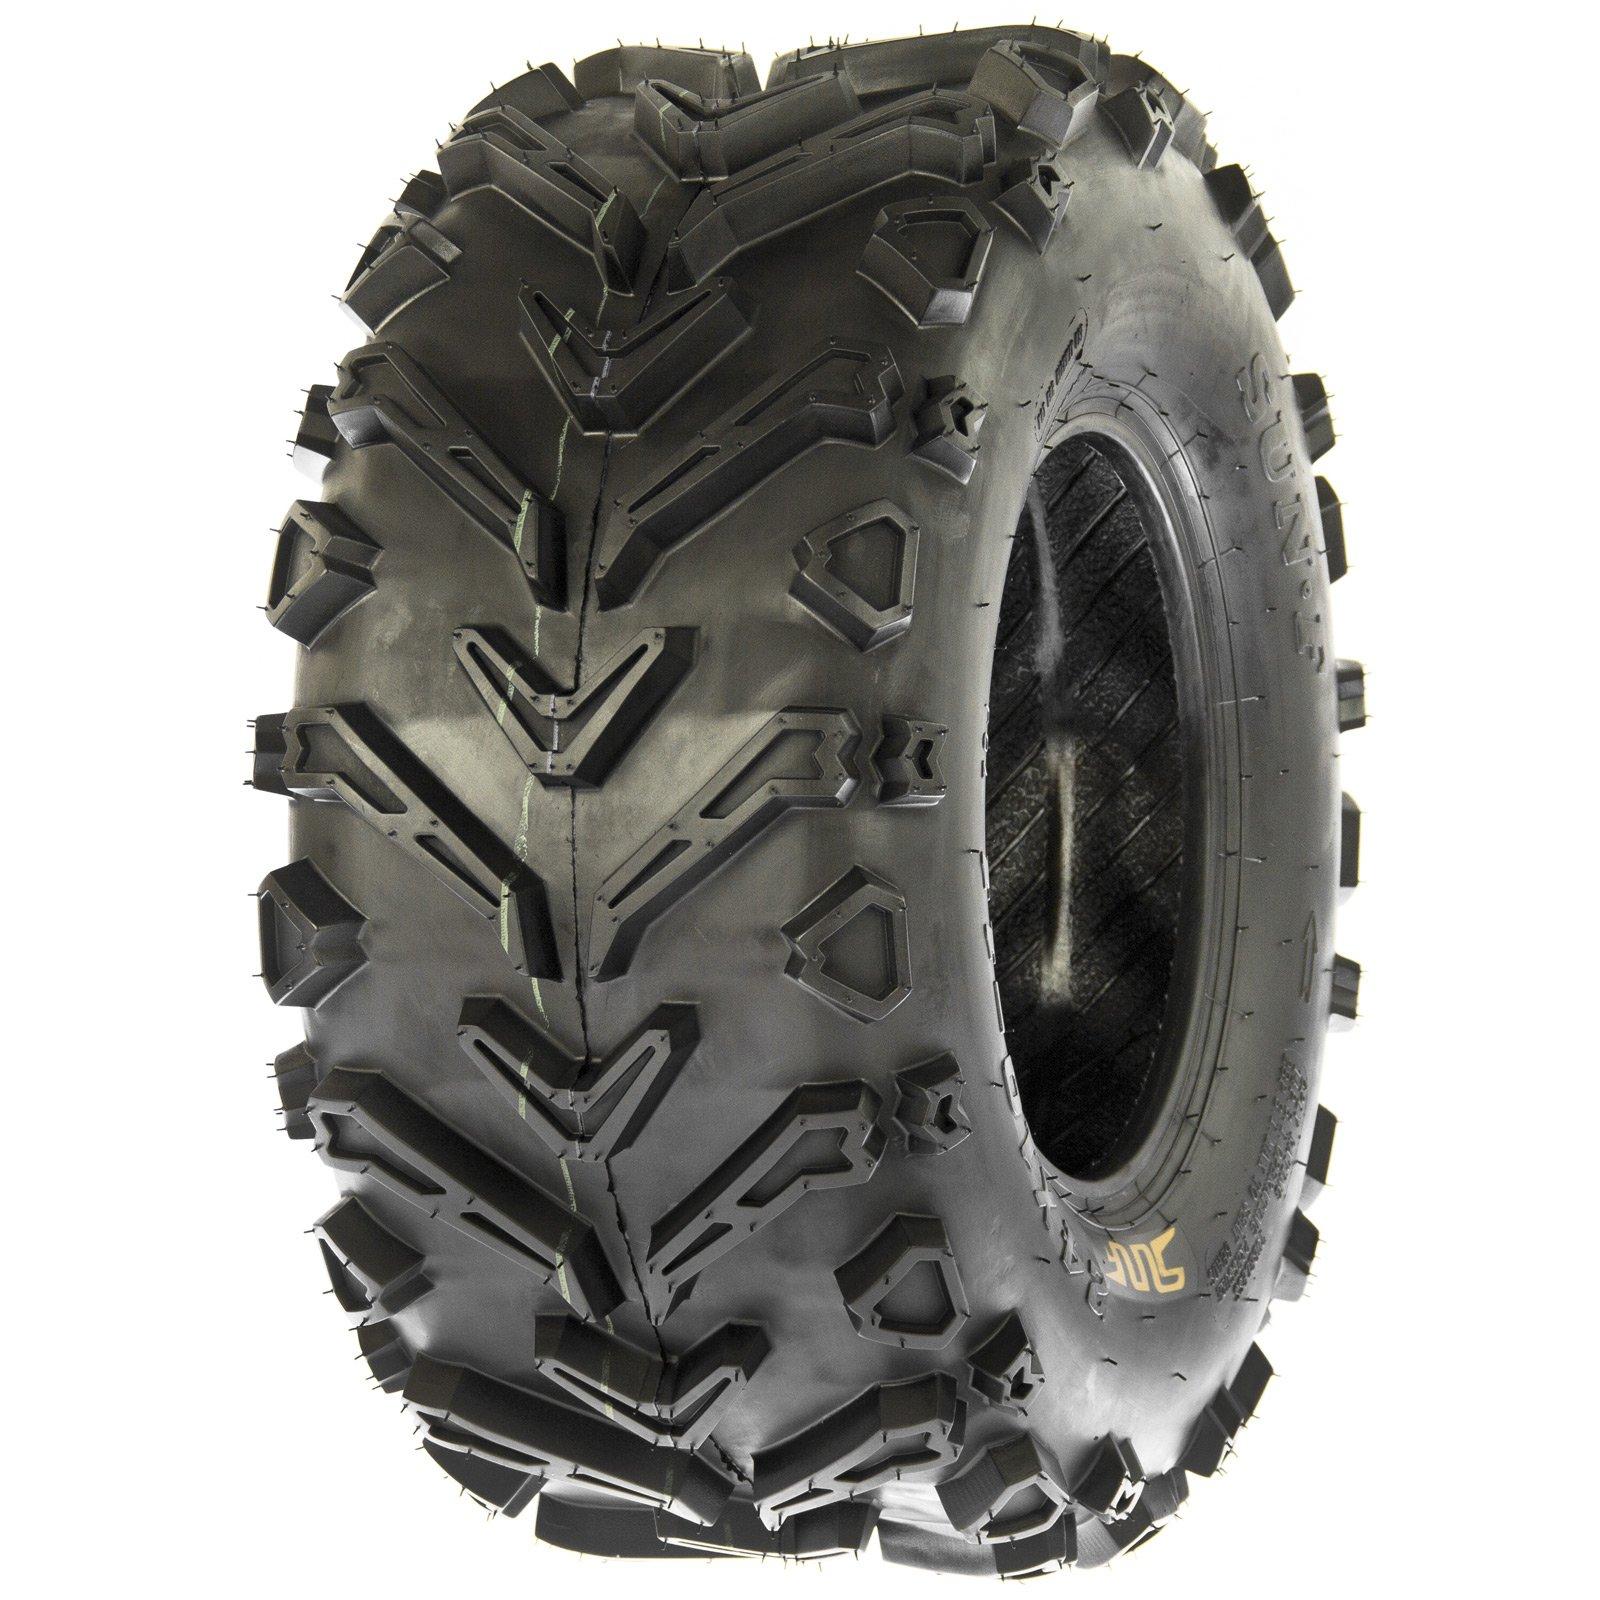 SunF All Trail & Mud ATV UTV Tires 24x8-12 24x10-11 6 PR A041 (Complete Full Set of 4) by SunF (Image #9)